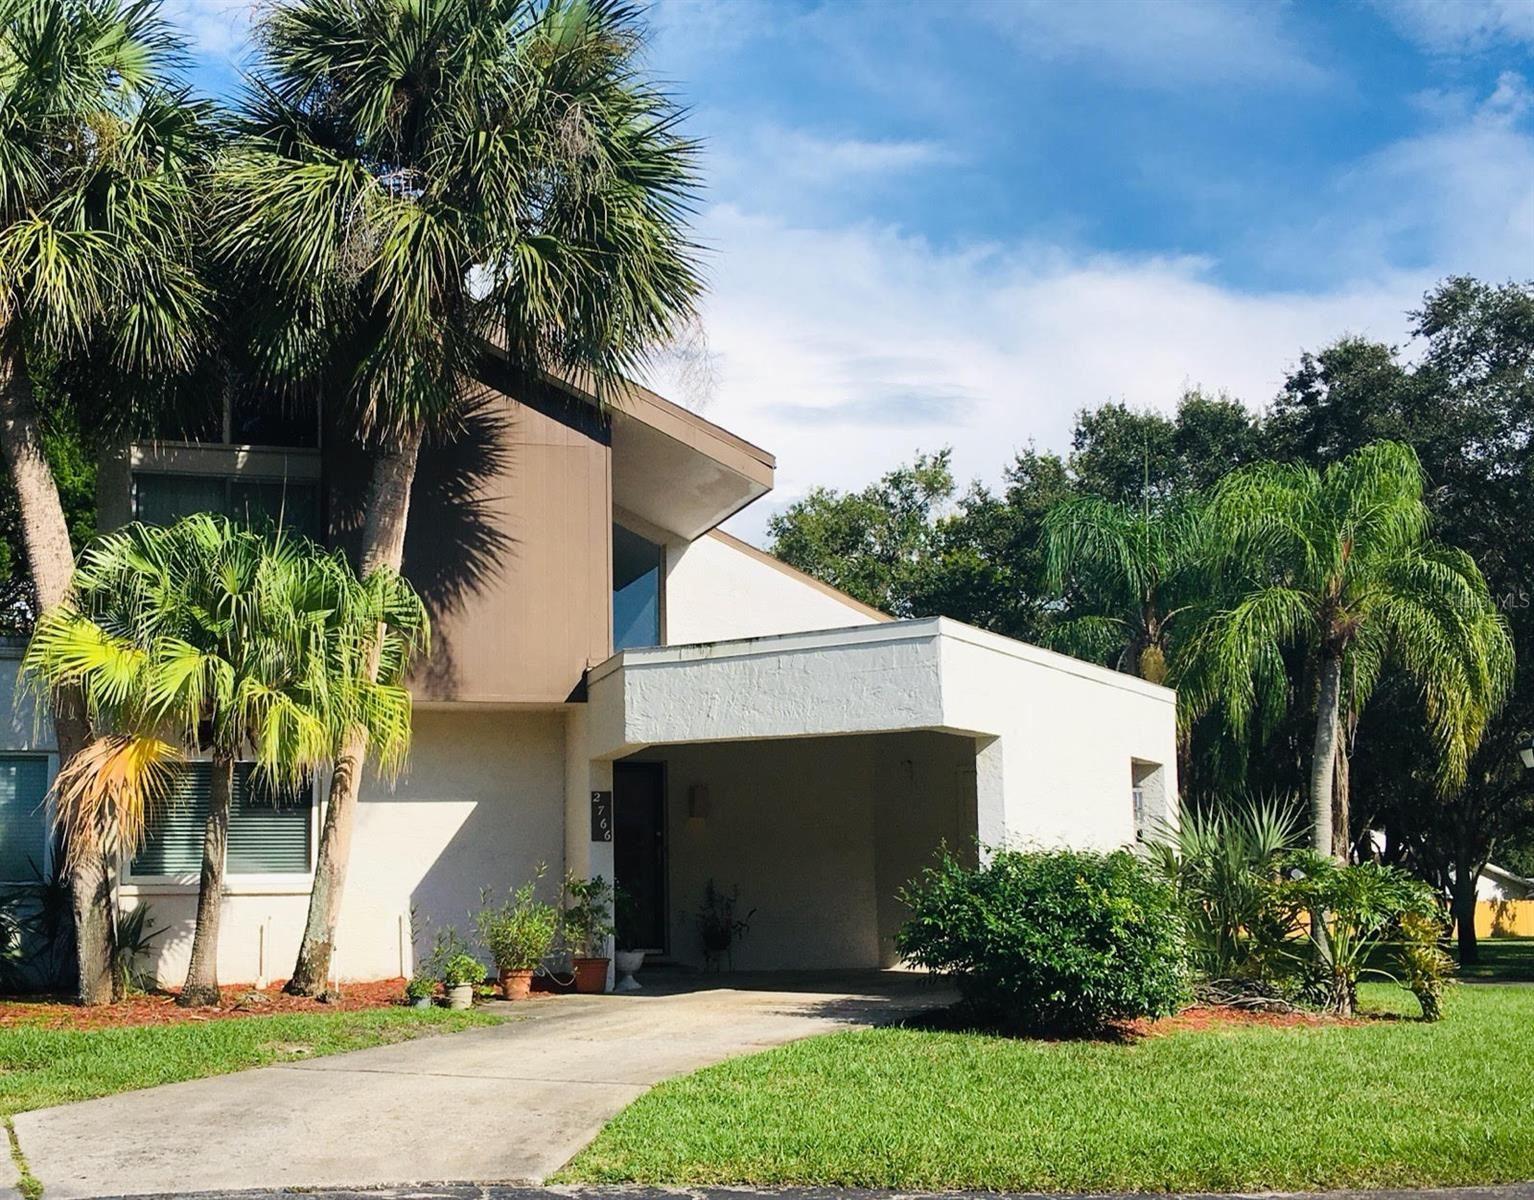 2766 HAVERHILL COURT #42C, Clearwater, FL 33761 - MLS#: U8136878